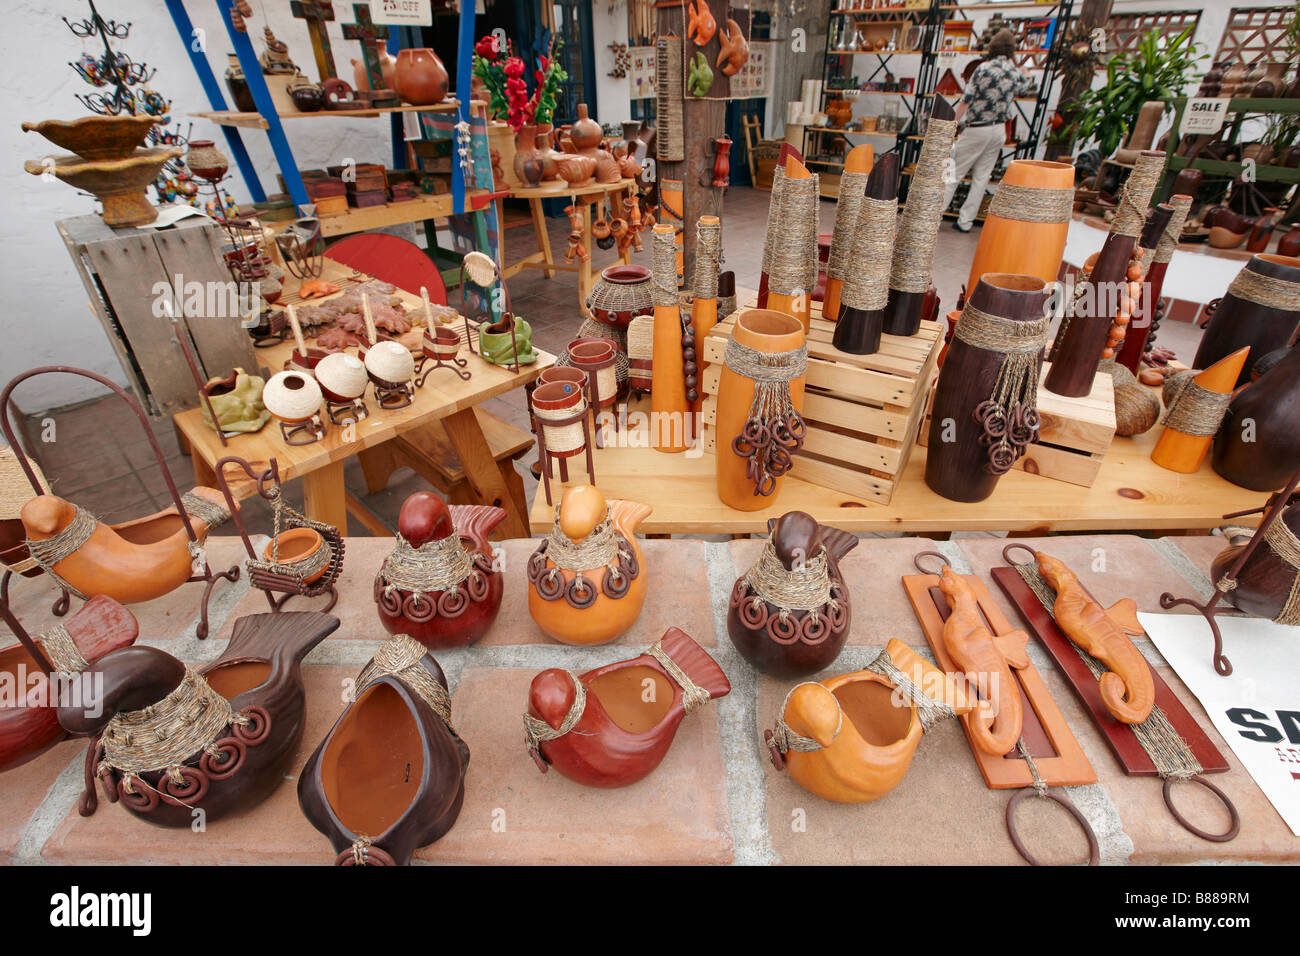 Gift shop display. Old Town San Diego, California, USA Stock Photo ...